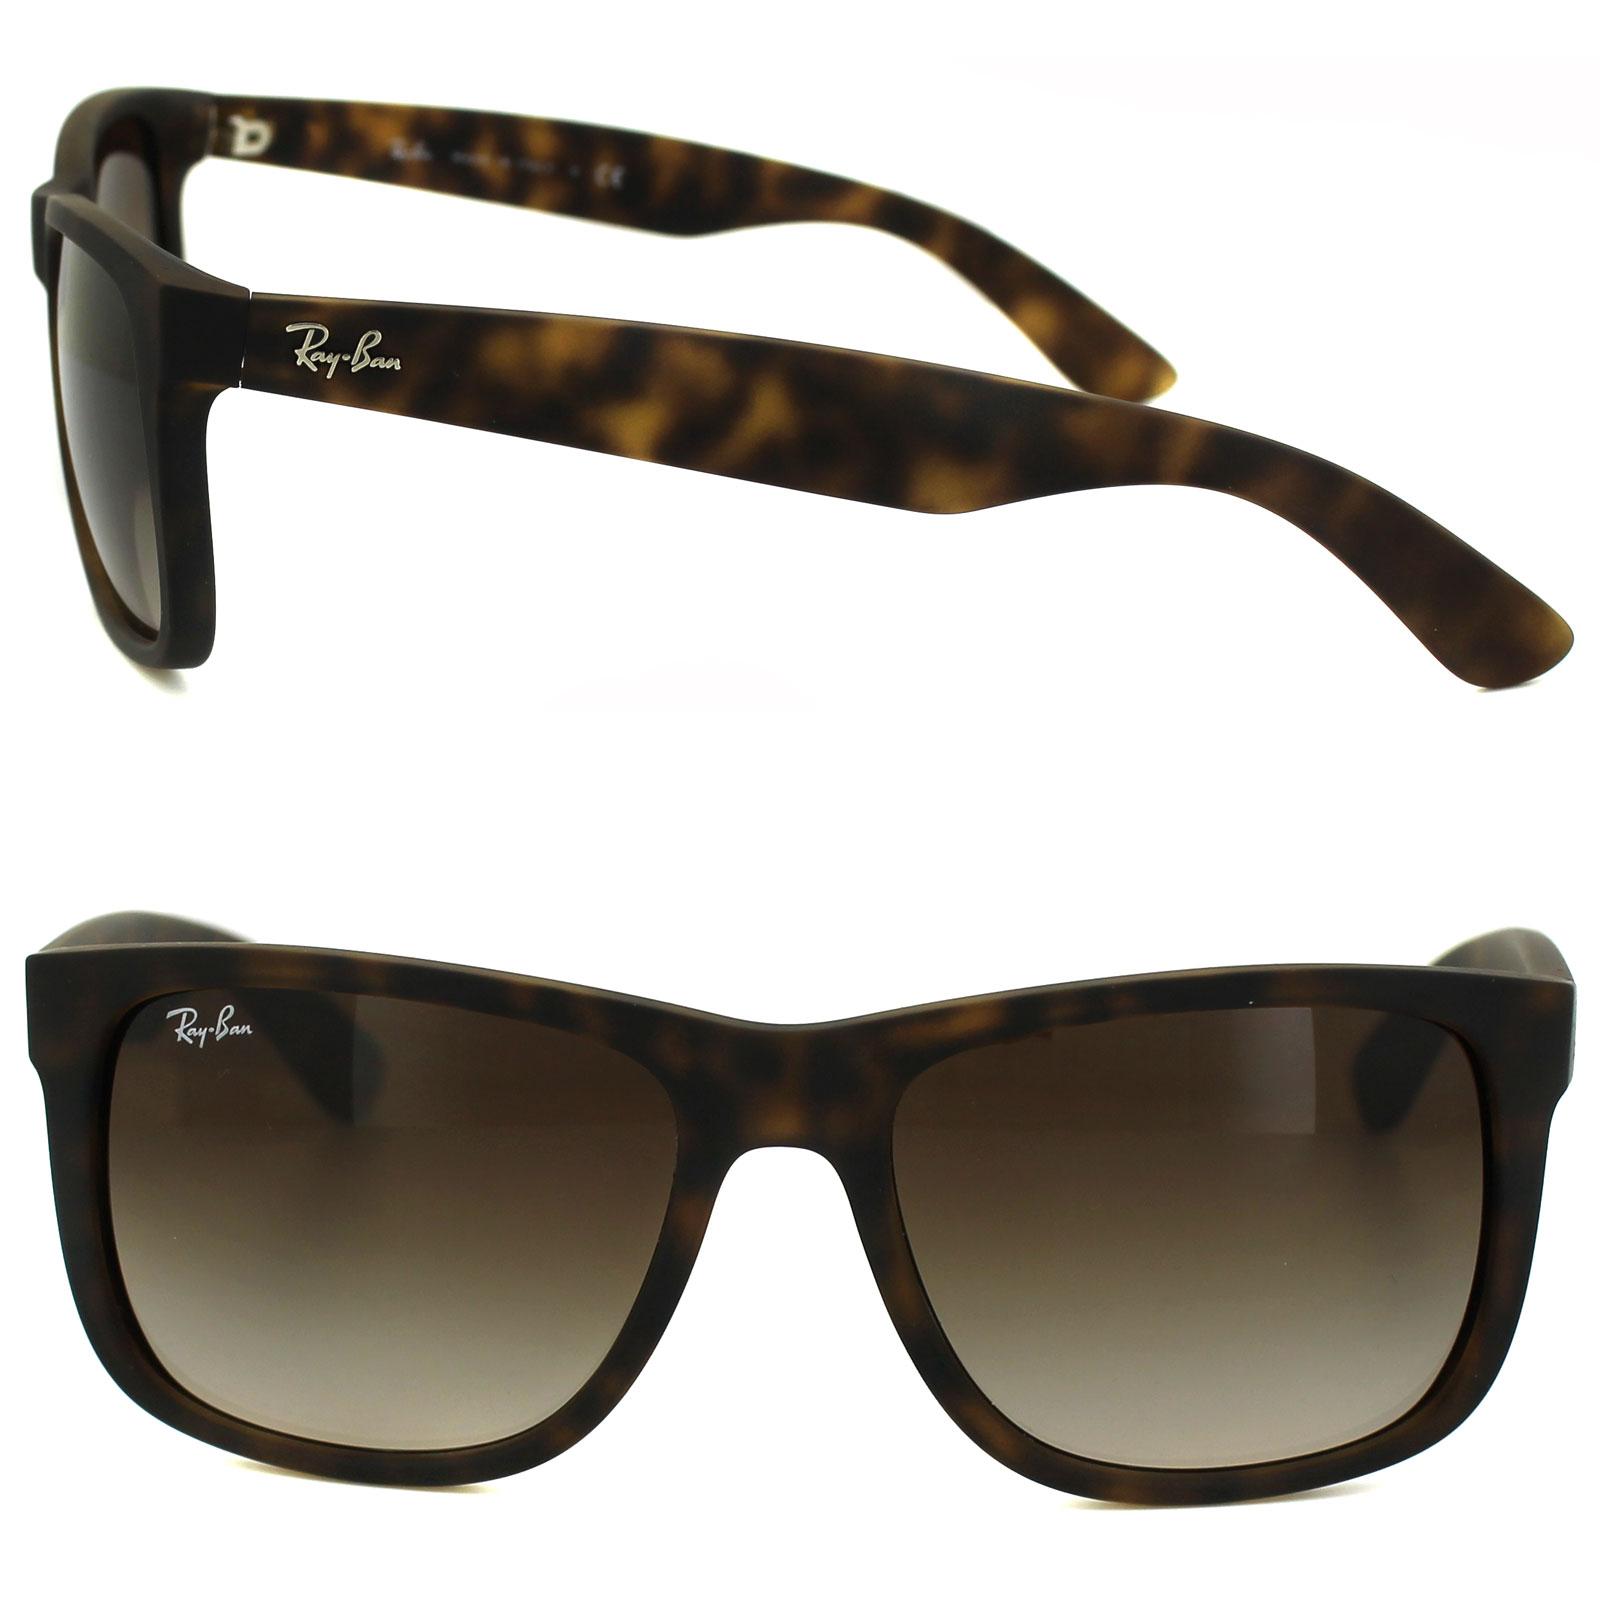 e7ed419303 Sentinel Rayban Sunglasses Justin 4165 Rubber Light Havana Brown Gradient  710 13